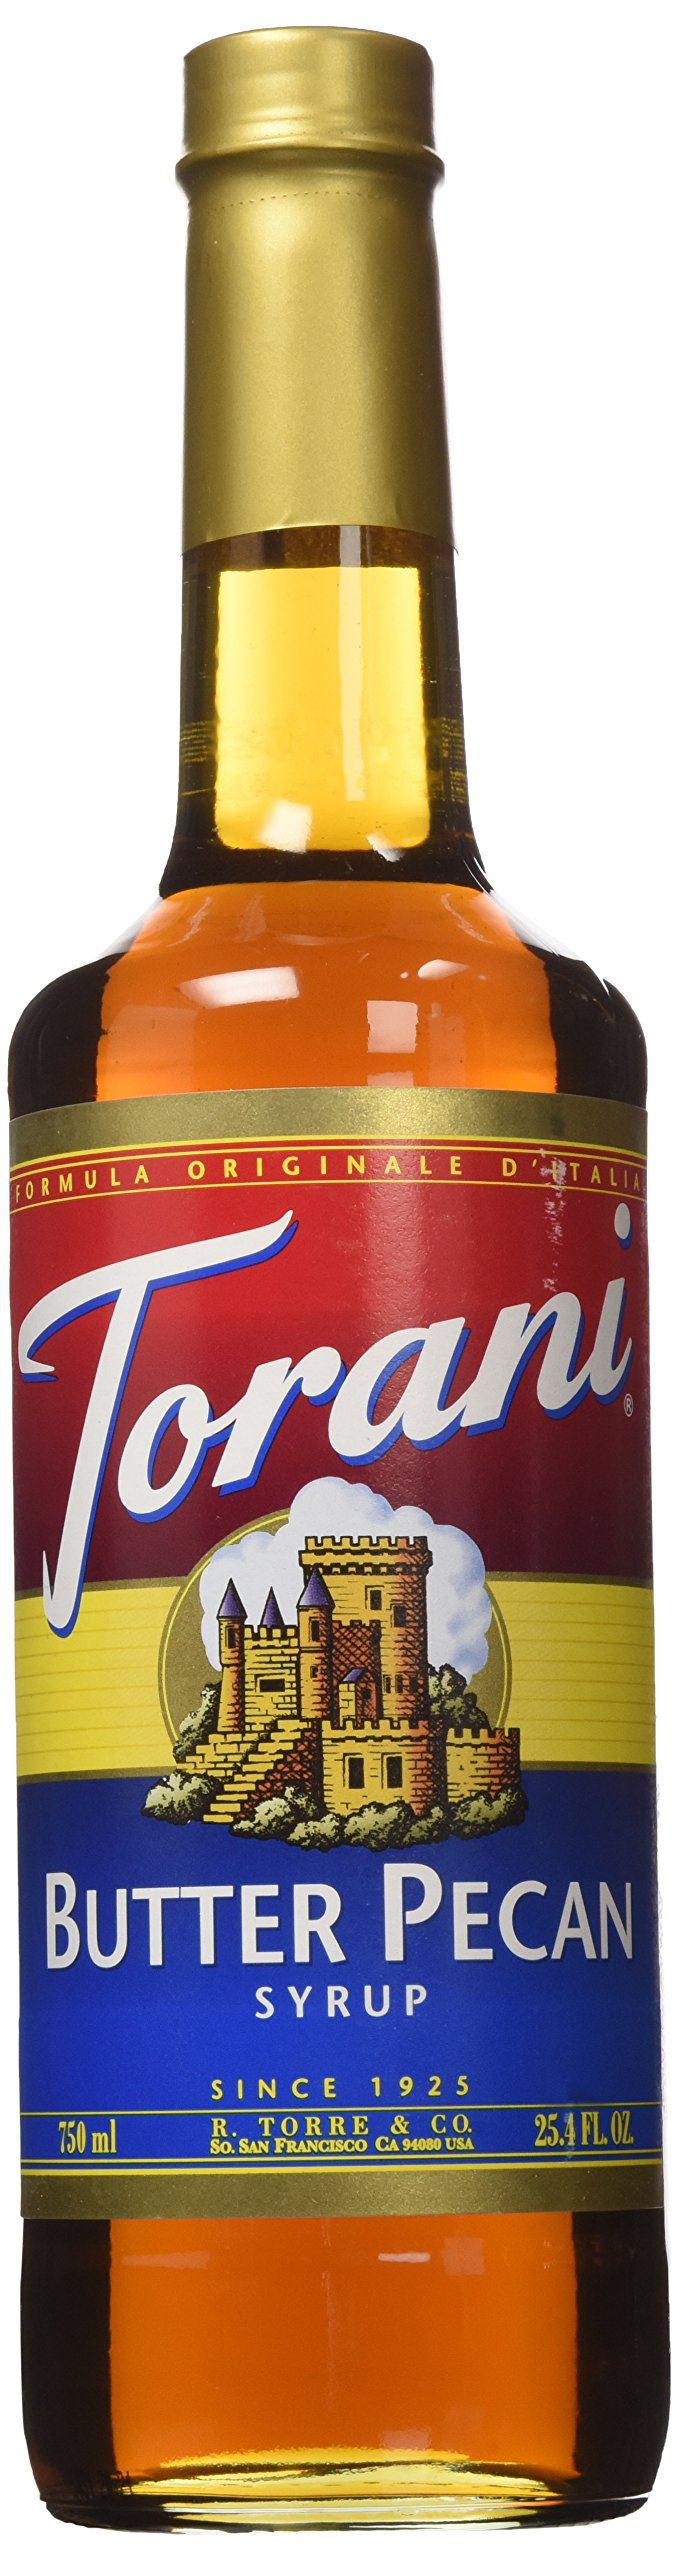 Torani Butter Pecan Syrup 750mL, 25 oz